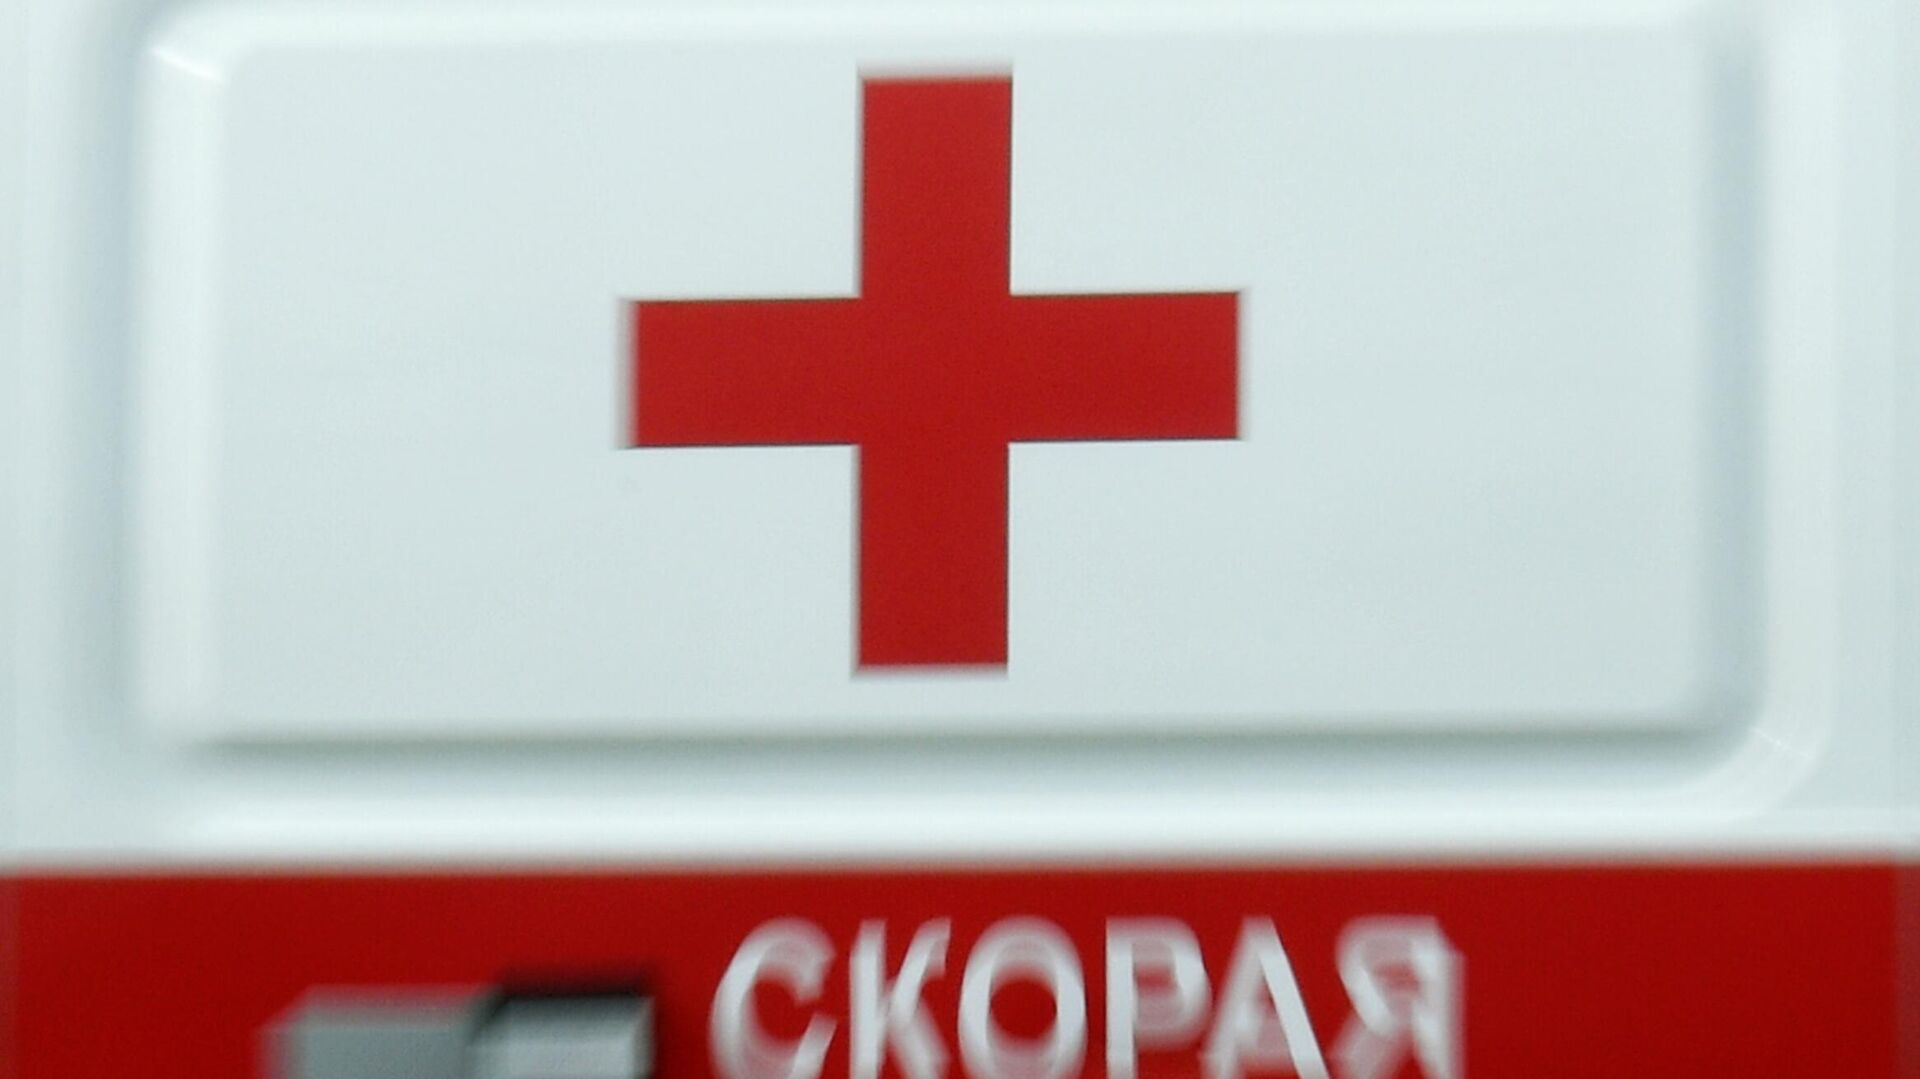 1568798980 0:127:2332:1438 1920x0 80 0 0 95409fd414de90647d64d98672a5e9f1 - Умер четвертый ребенок, пострадавший при пожаре в Тюмени